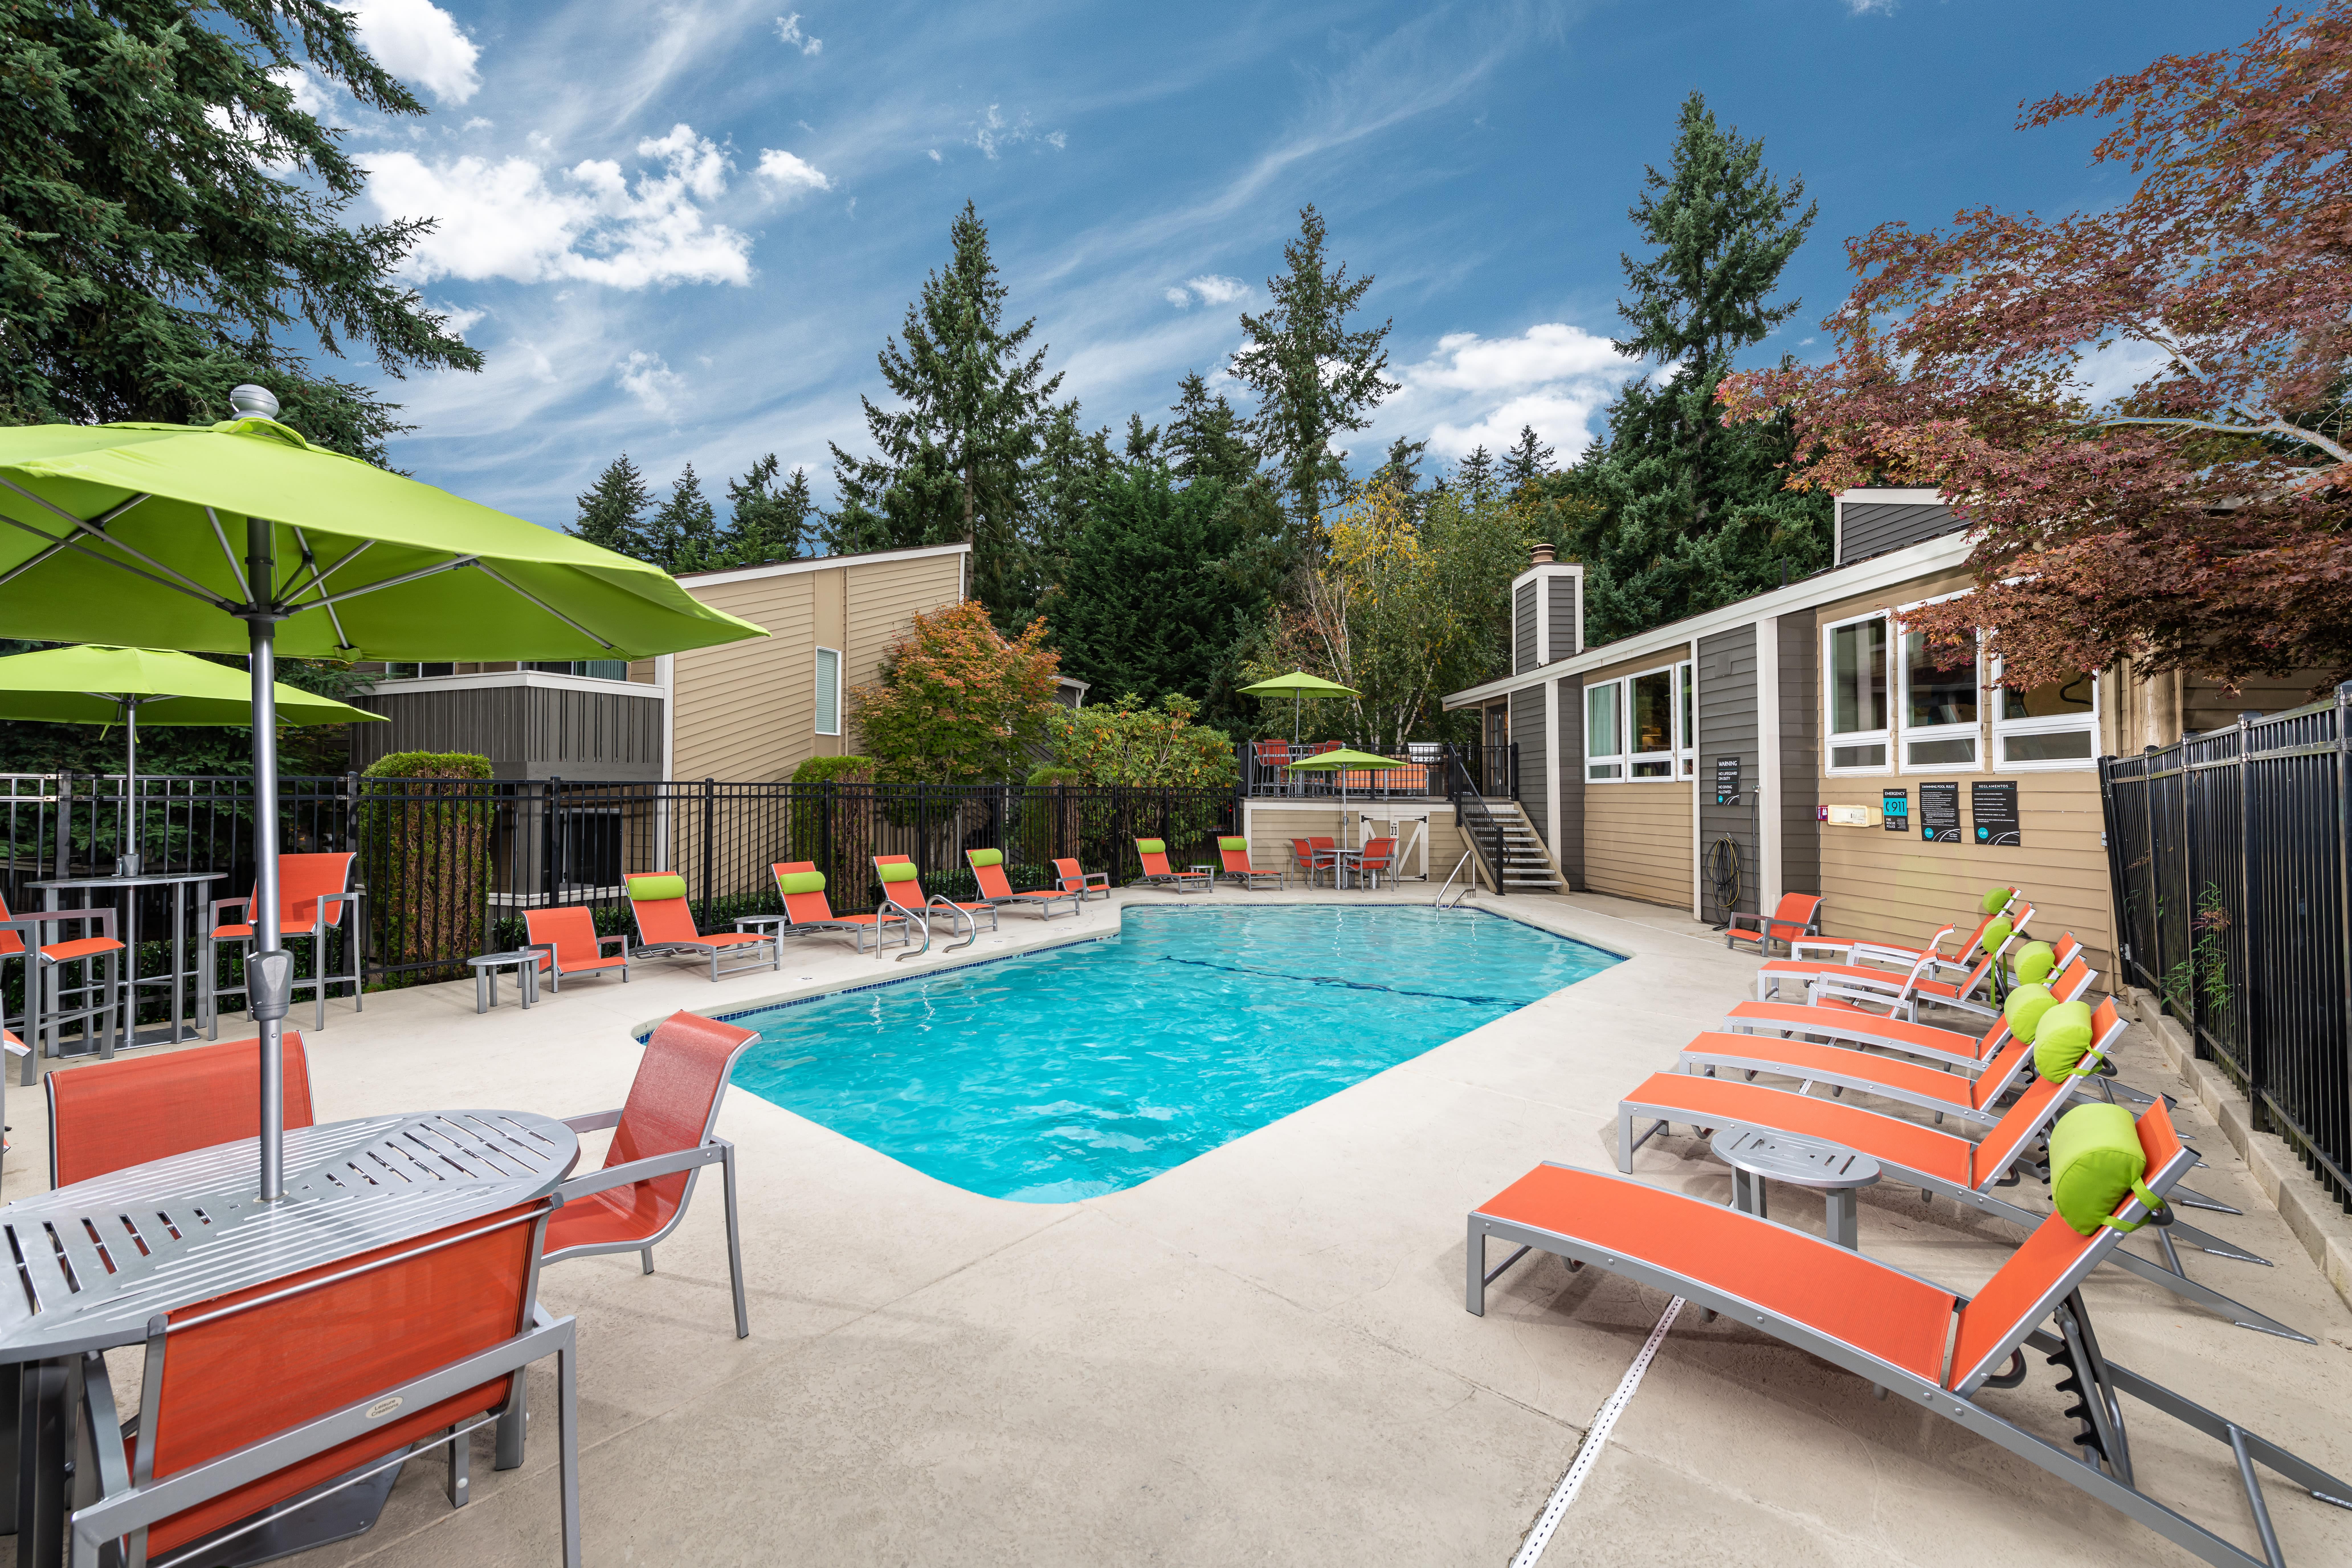 Pool at Vue Kirkland Apartments in Kirkland, Washington